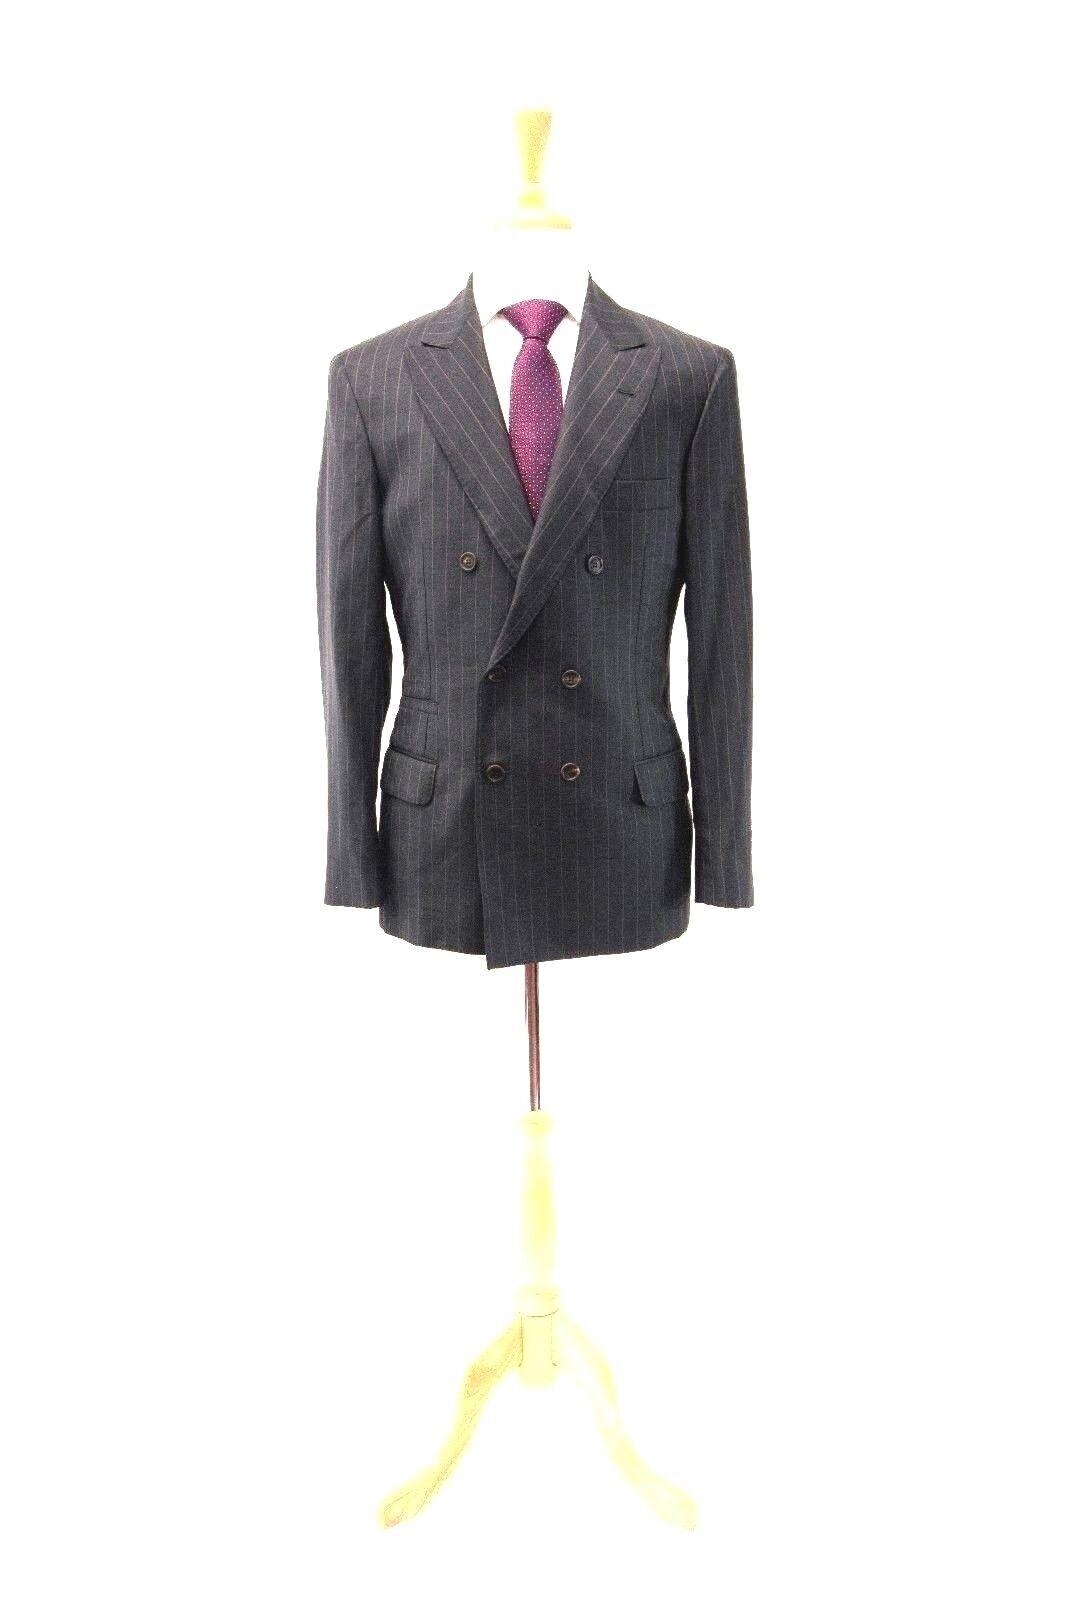 NWT4585 Brunello Cucinelli Men 100% Wool Pinstriped DB 2Pc Logo Suit 48/38 A181